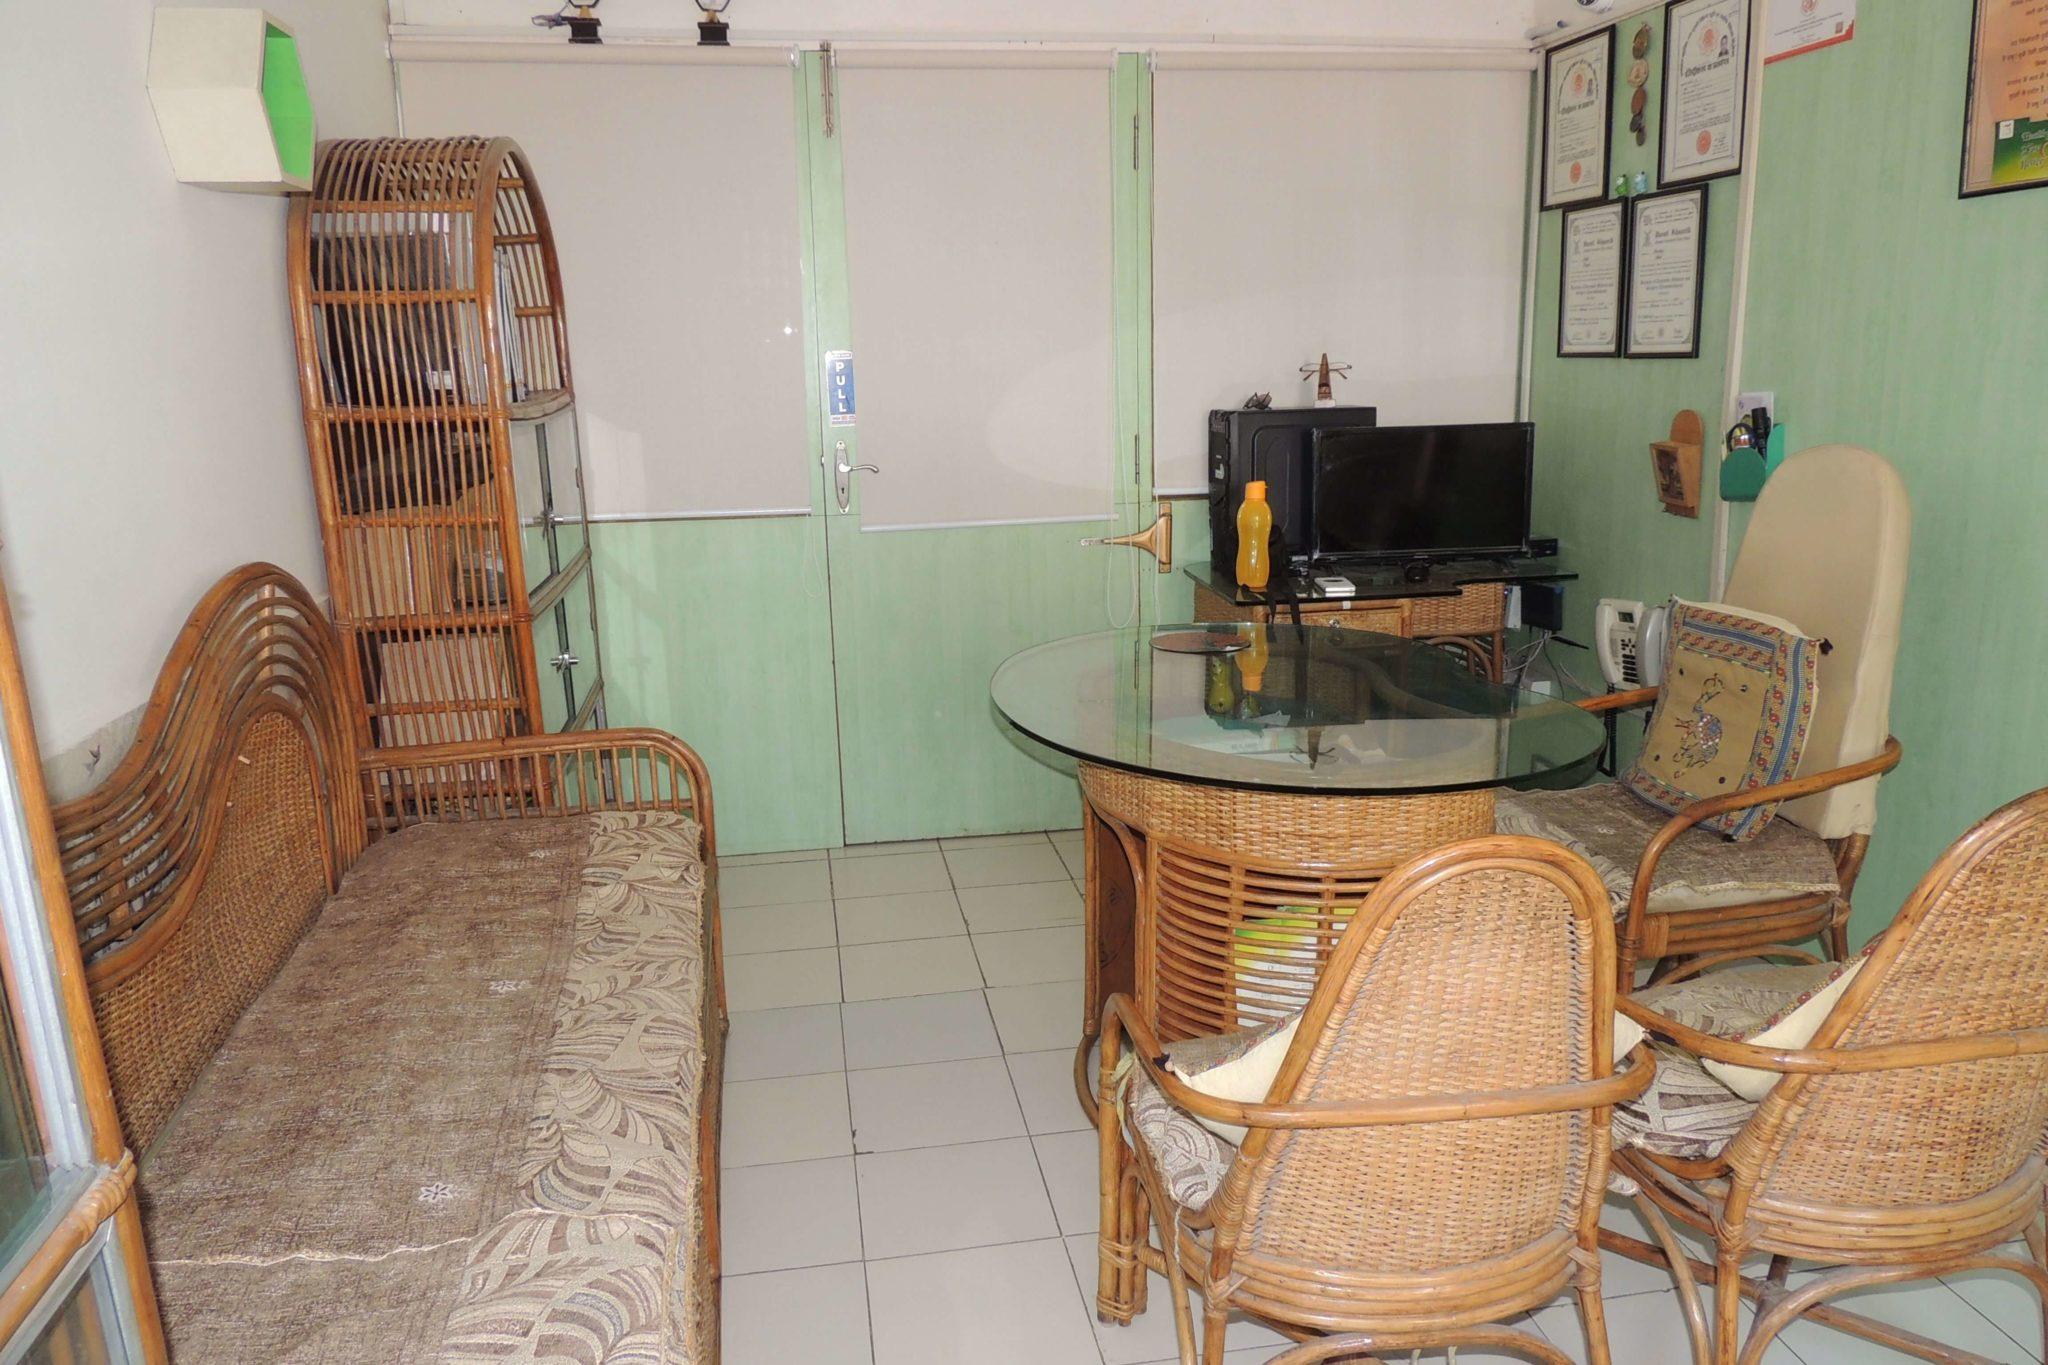 Dr Shahs Clinic Consultation room 3